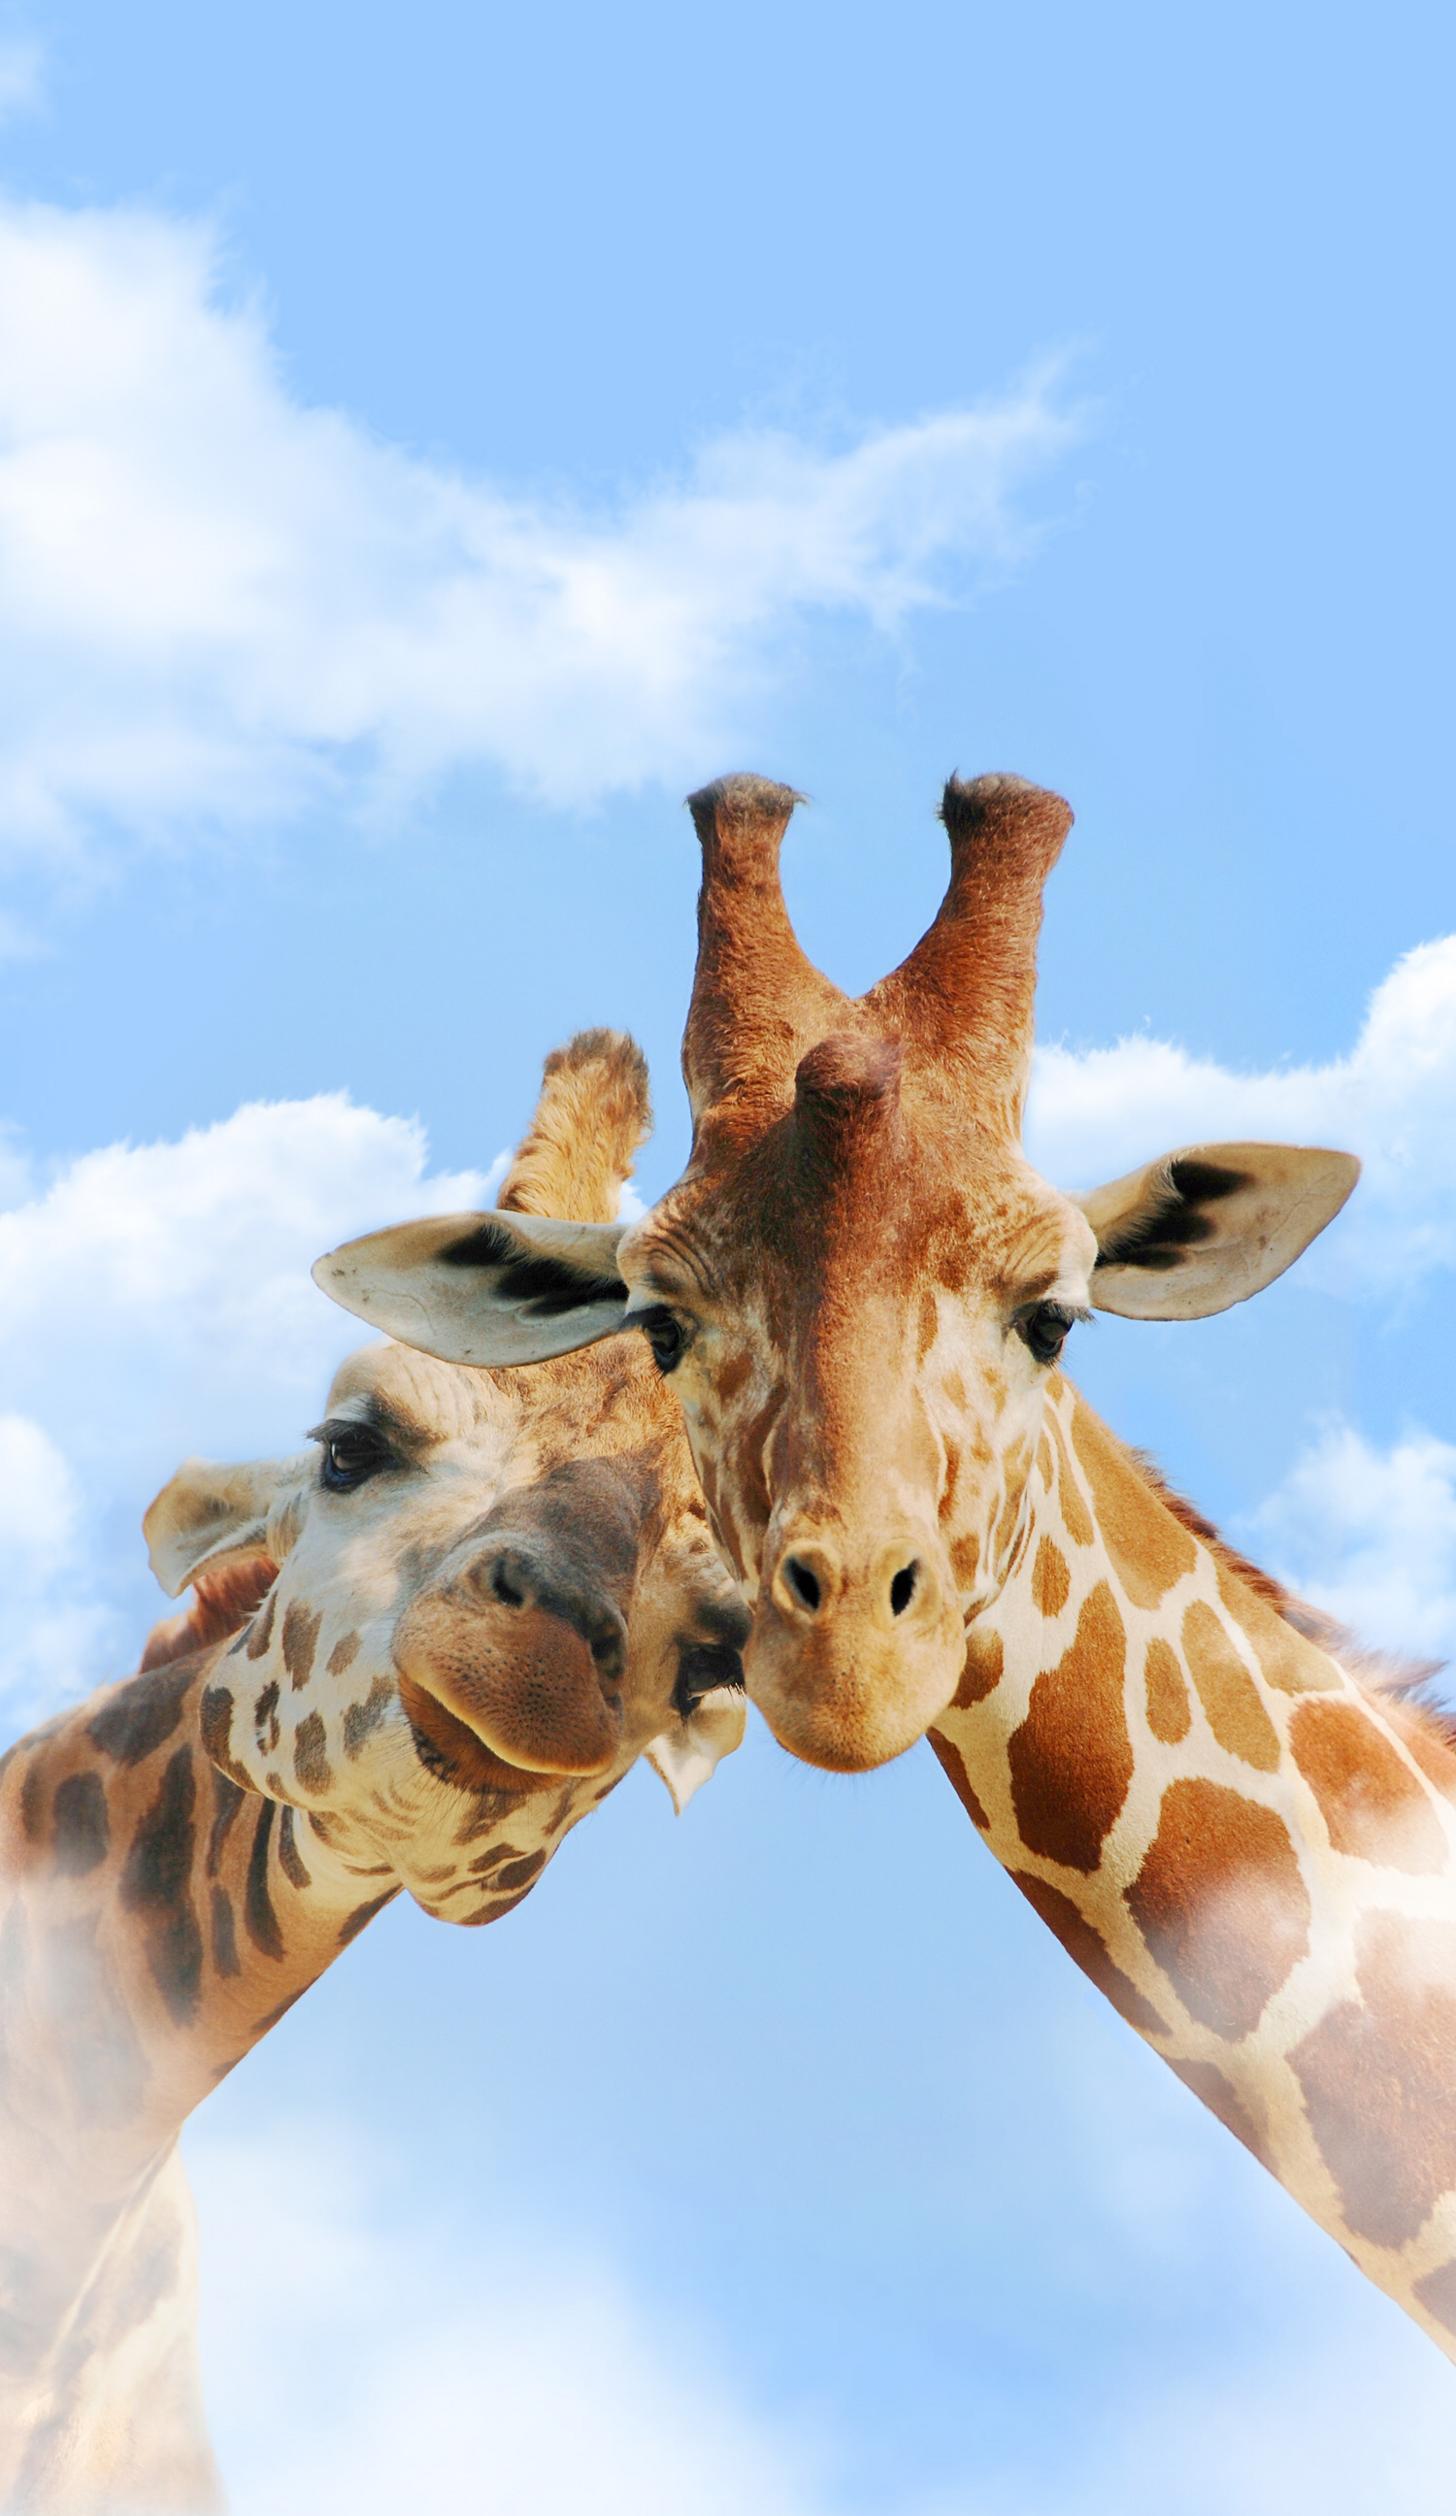 All Animals Wallpaper Dump Animals Animal Wallpaper Giraffe Pictures